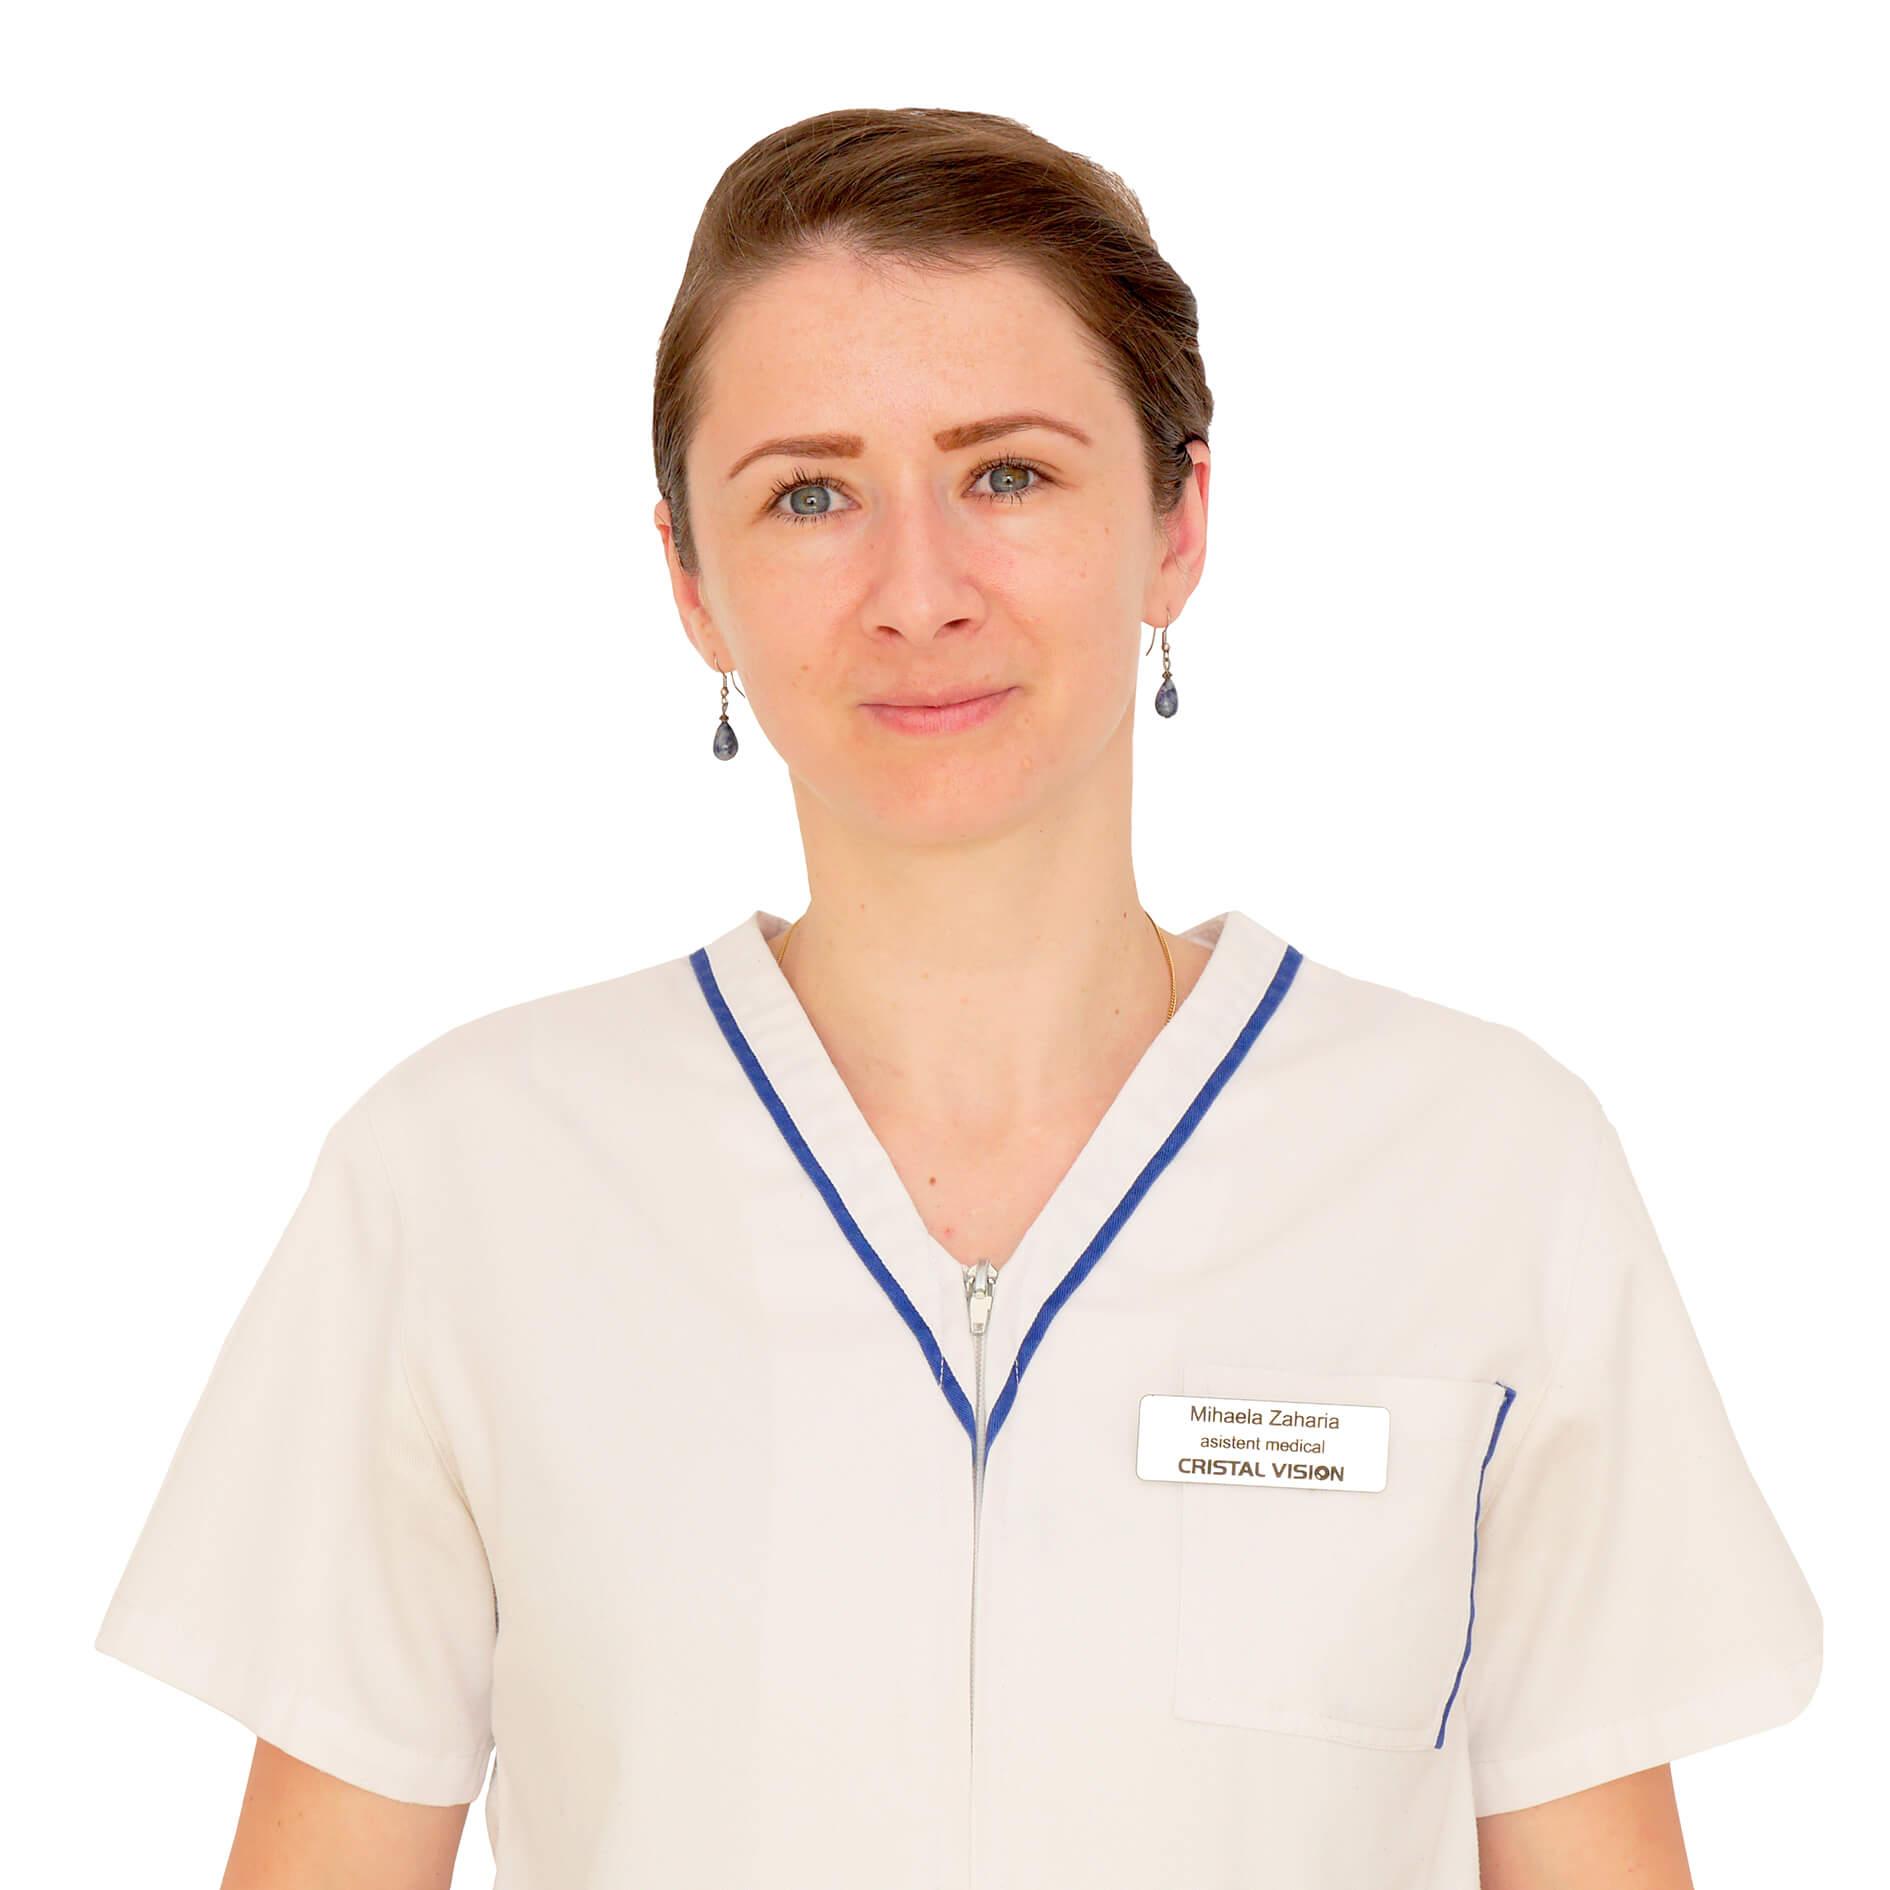 Mihaela-Zaharia-asistent-medical-generalist